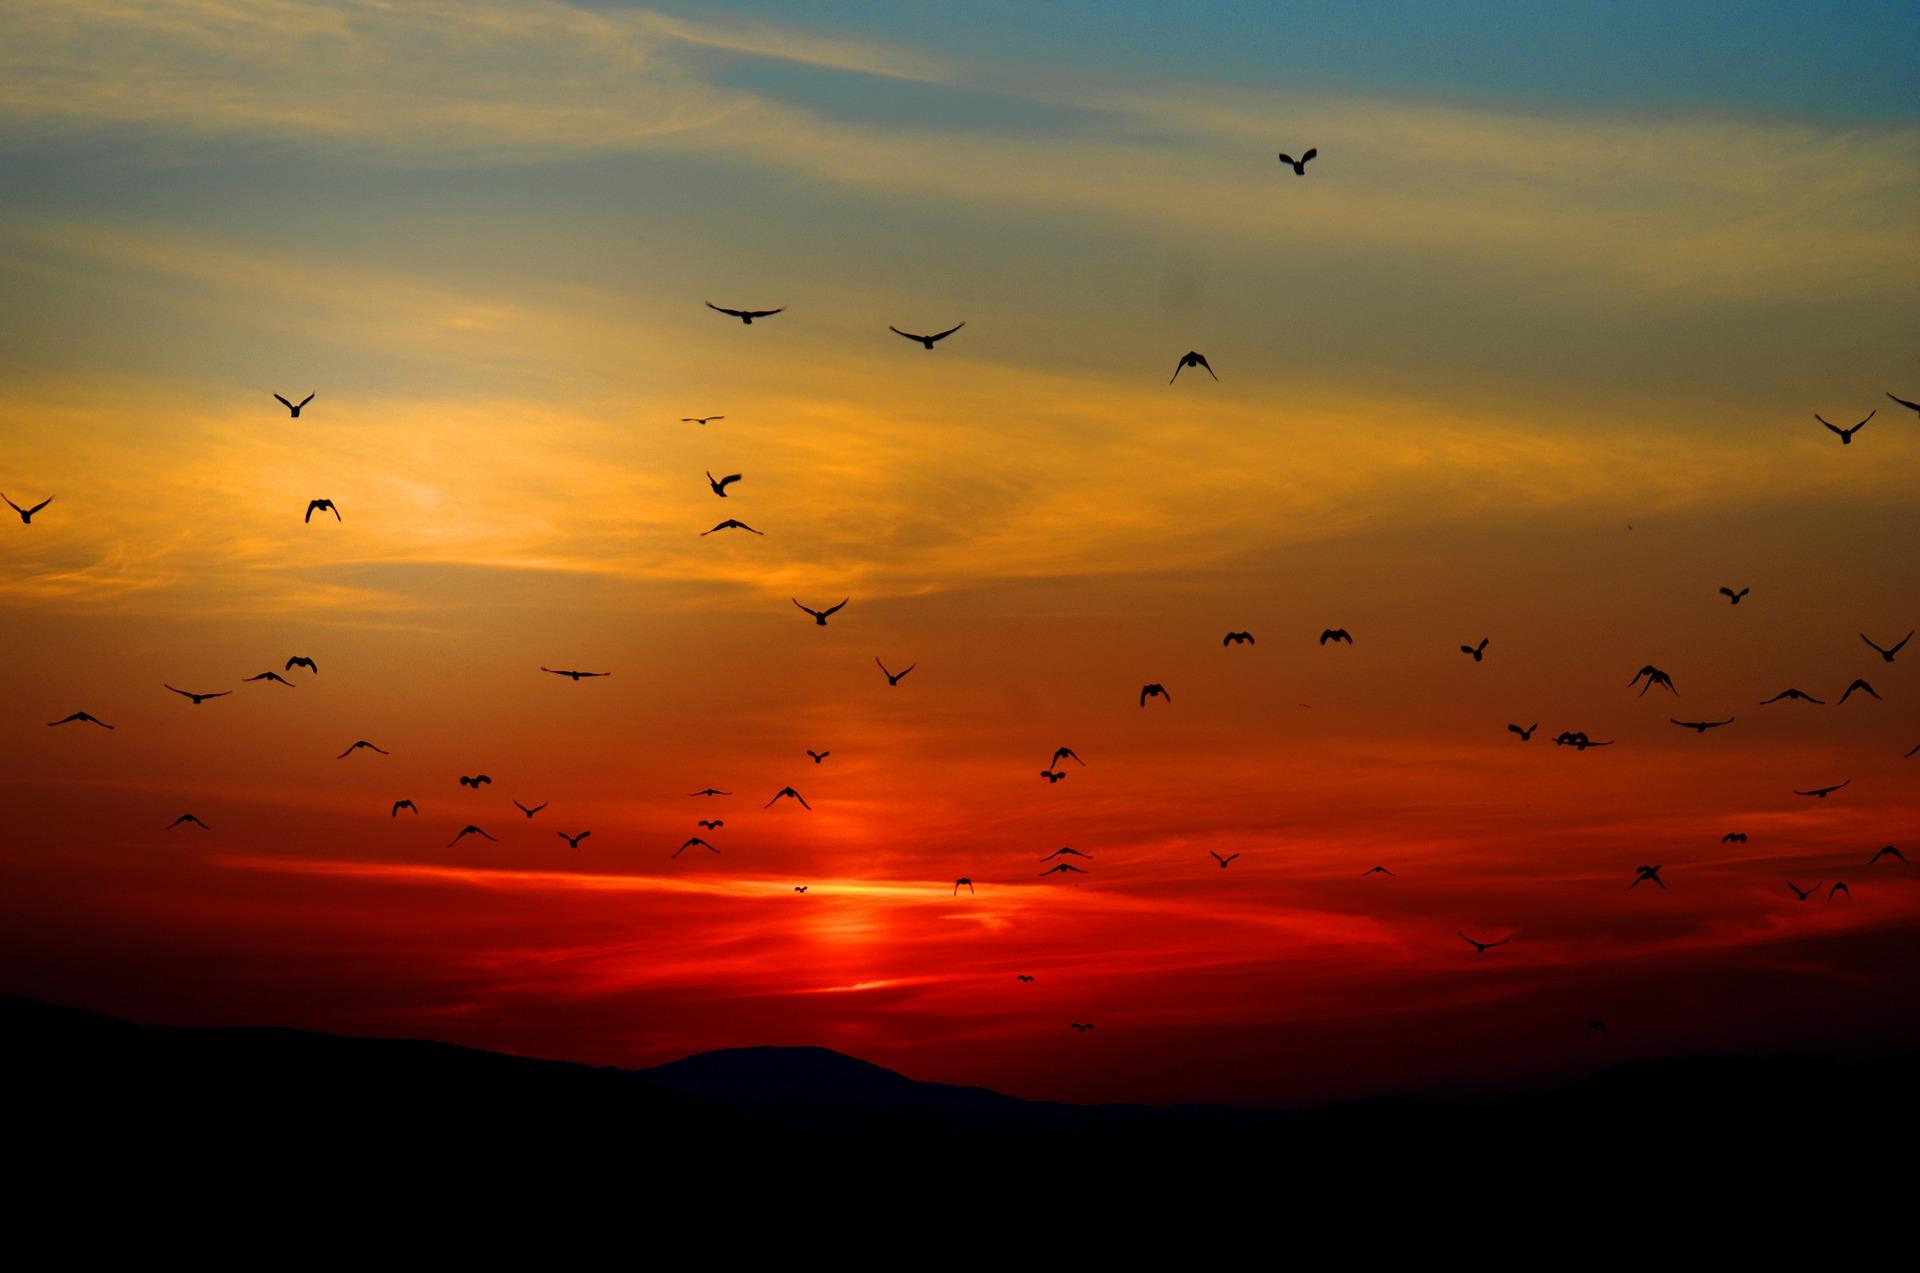 sunset-100367_1920